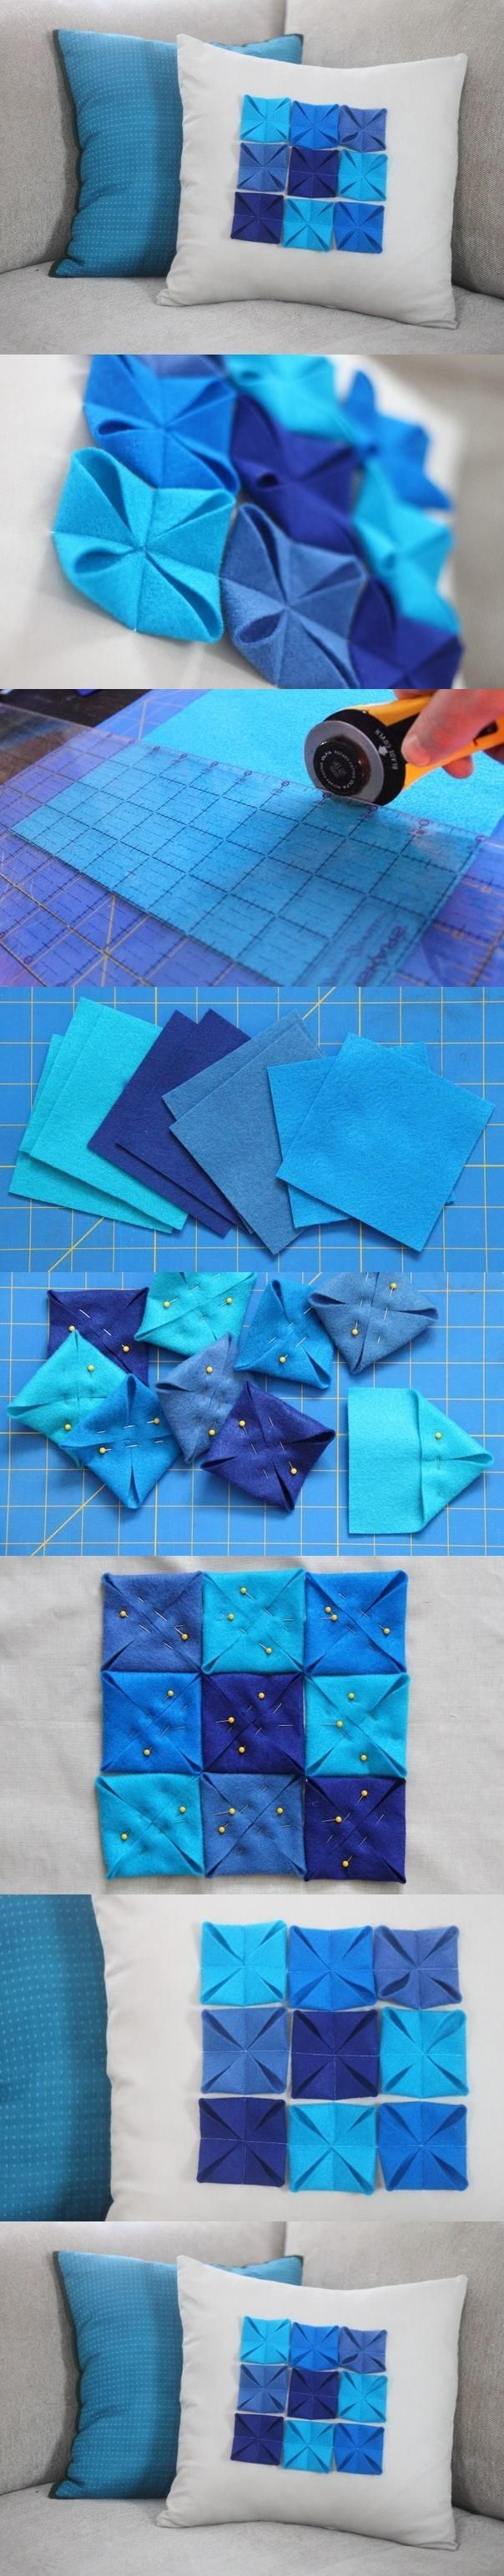 15 Projetos de diy para lindas almofadas